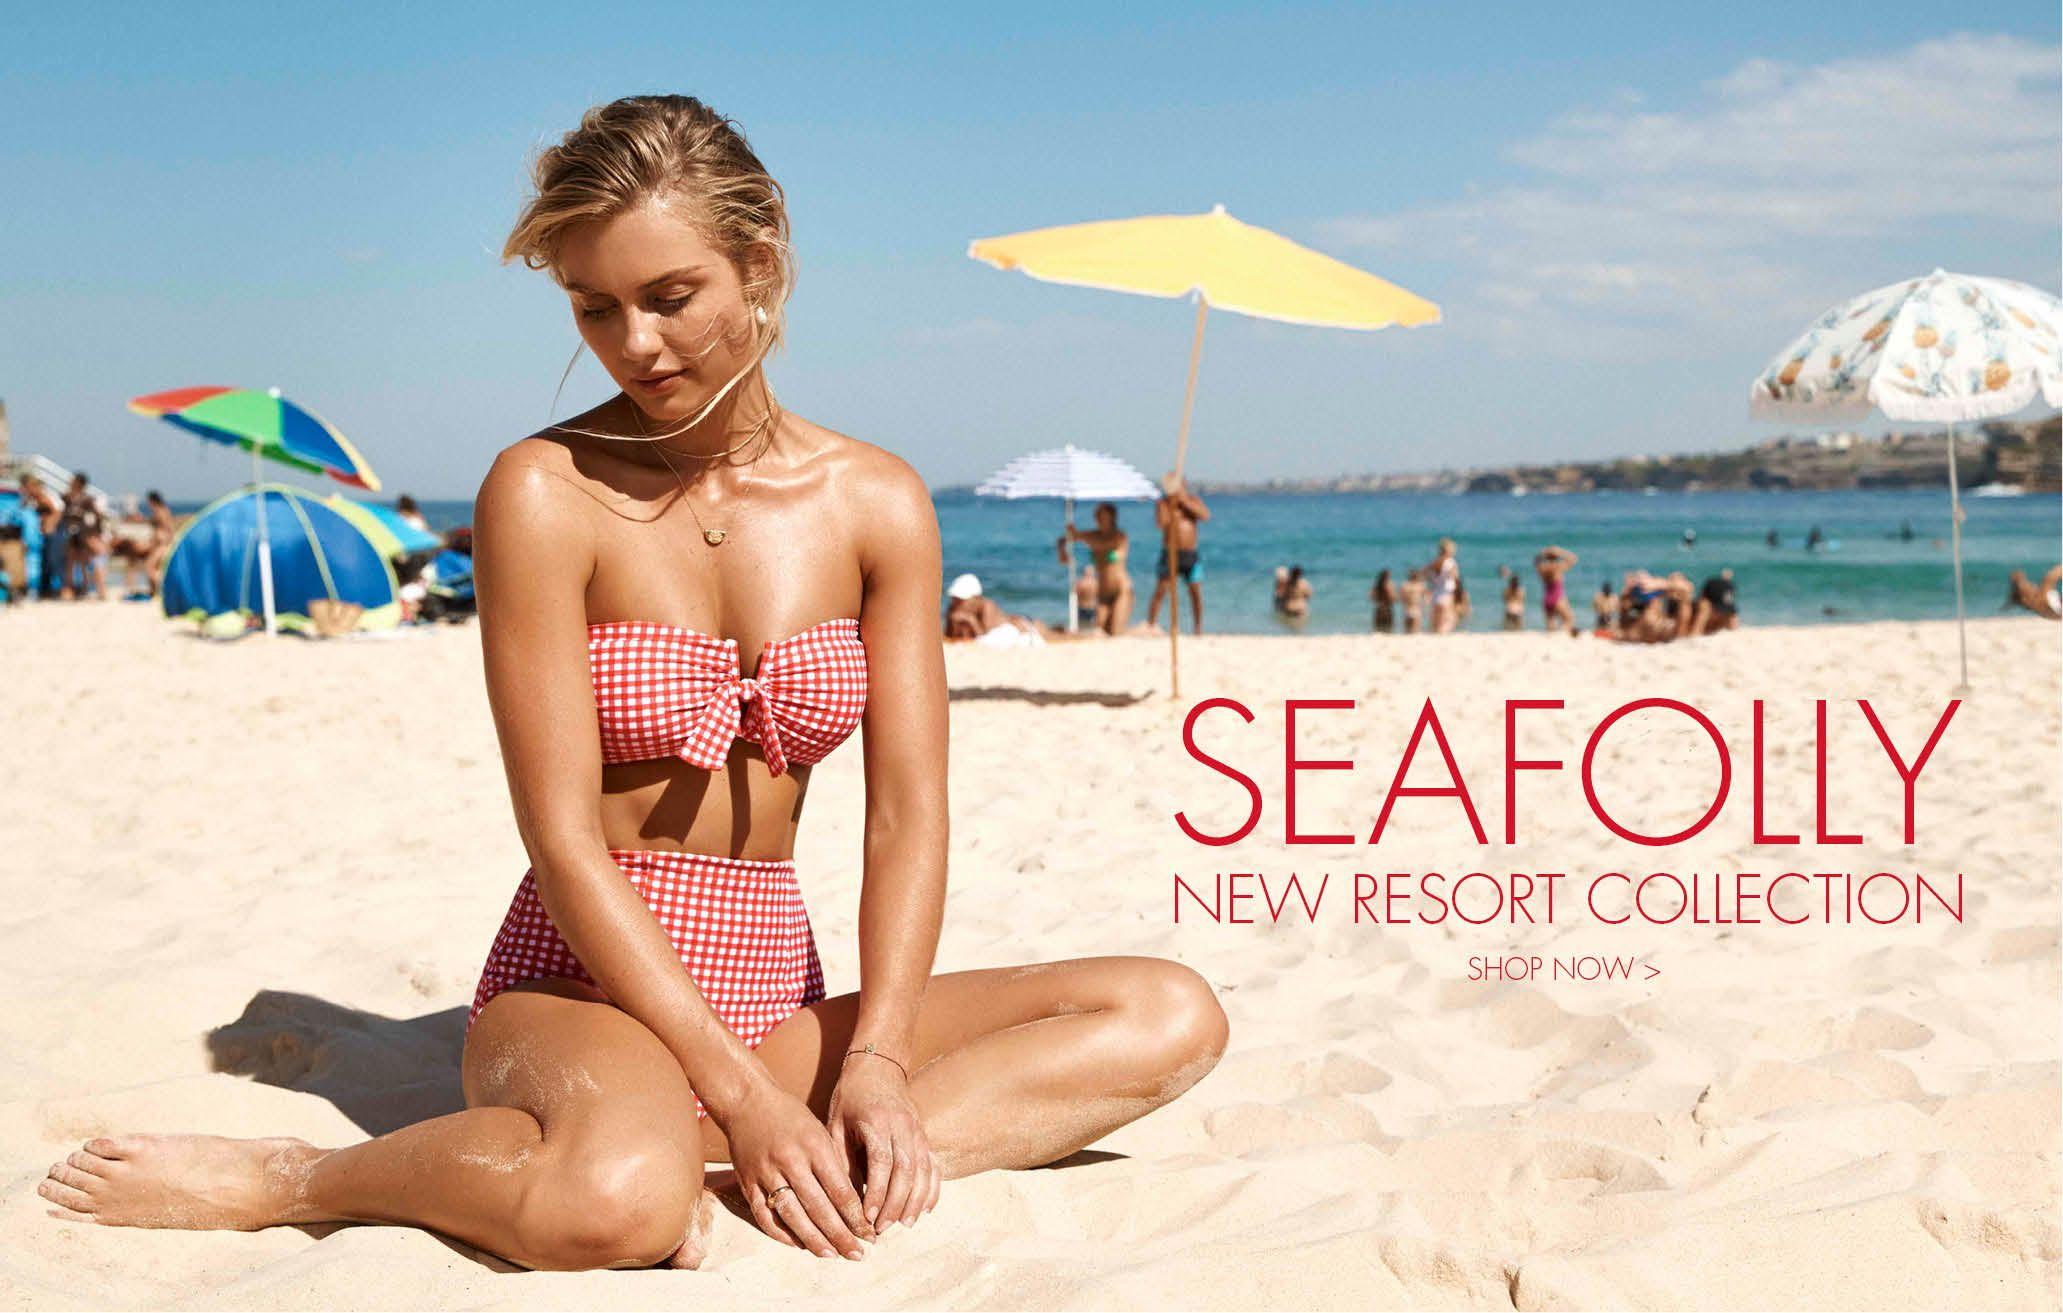 Seafolly Resortwear 2018